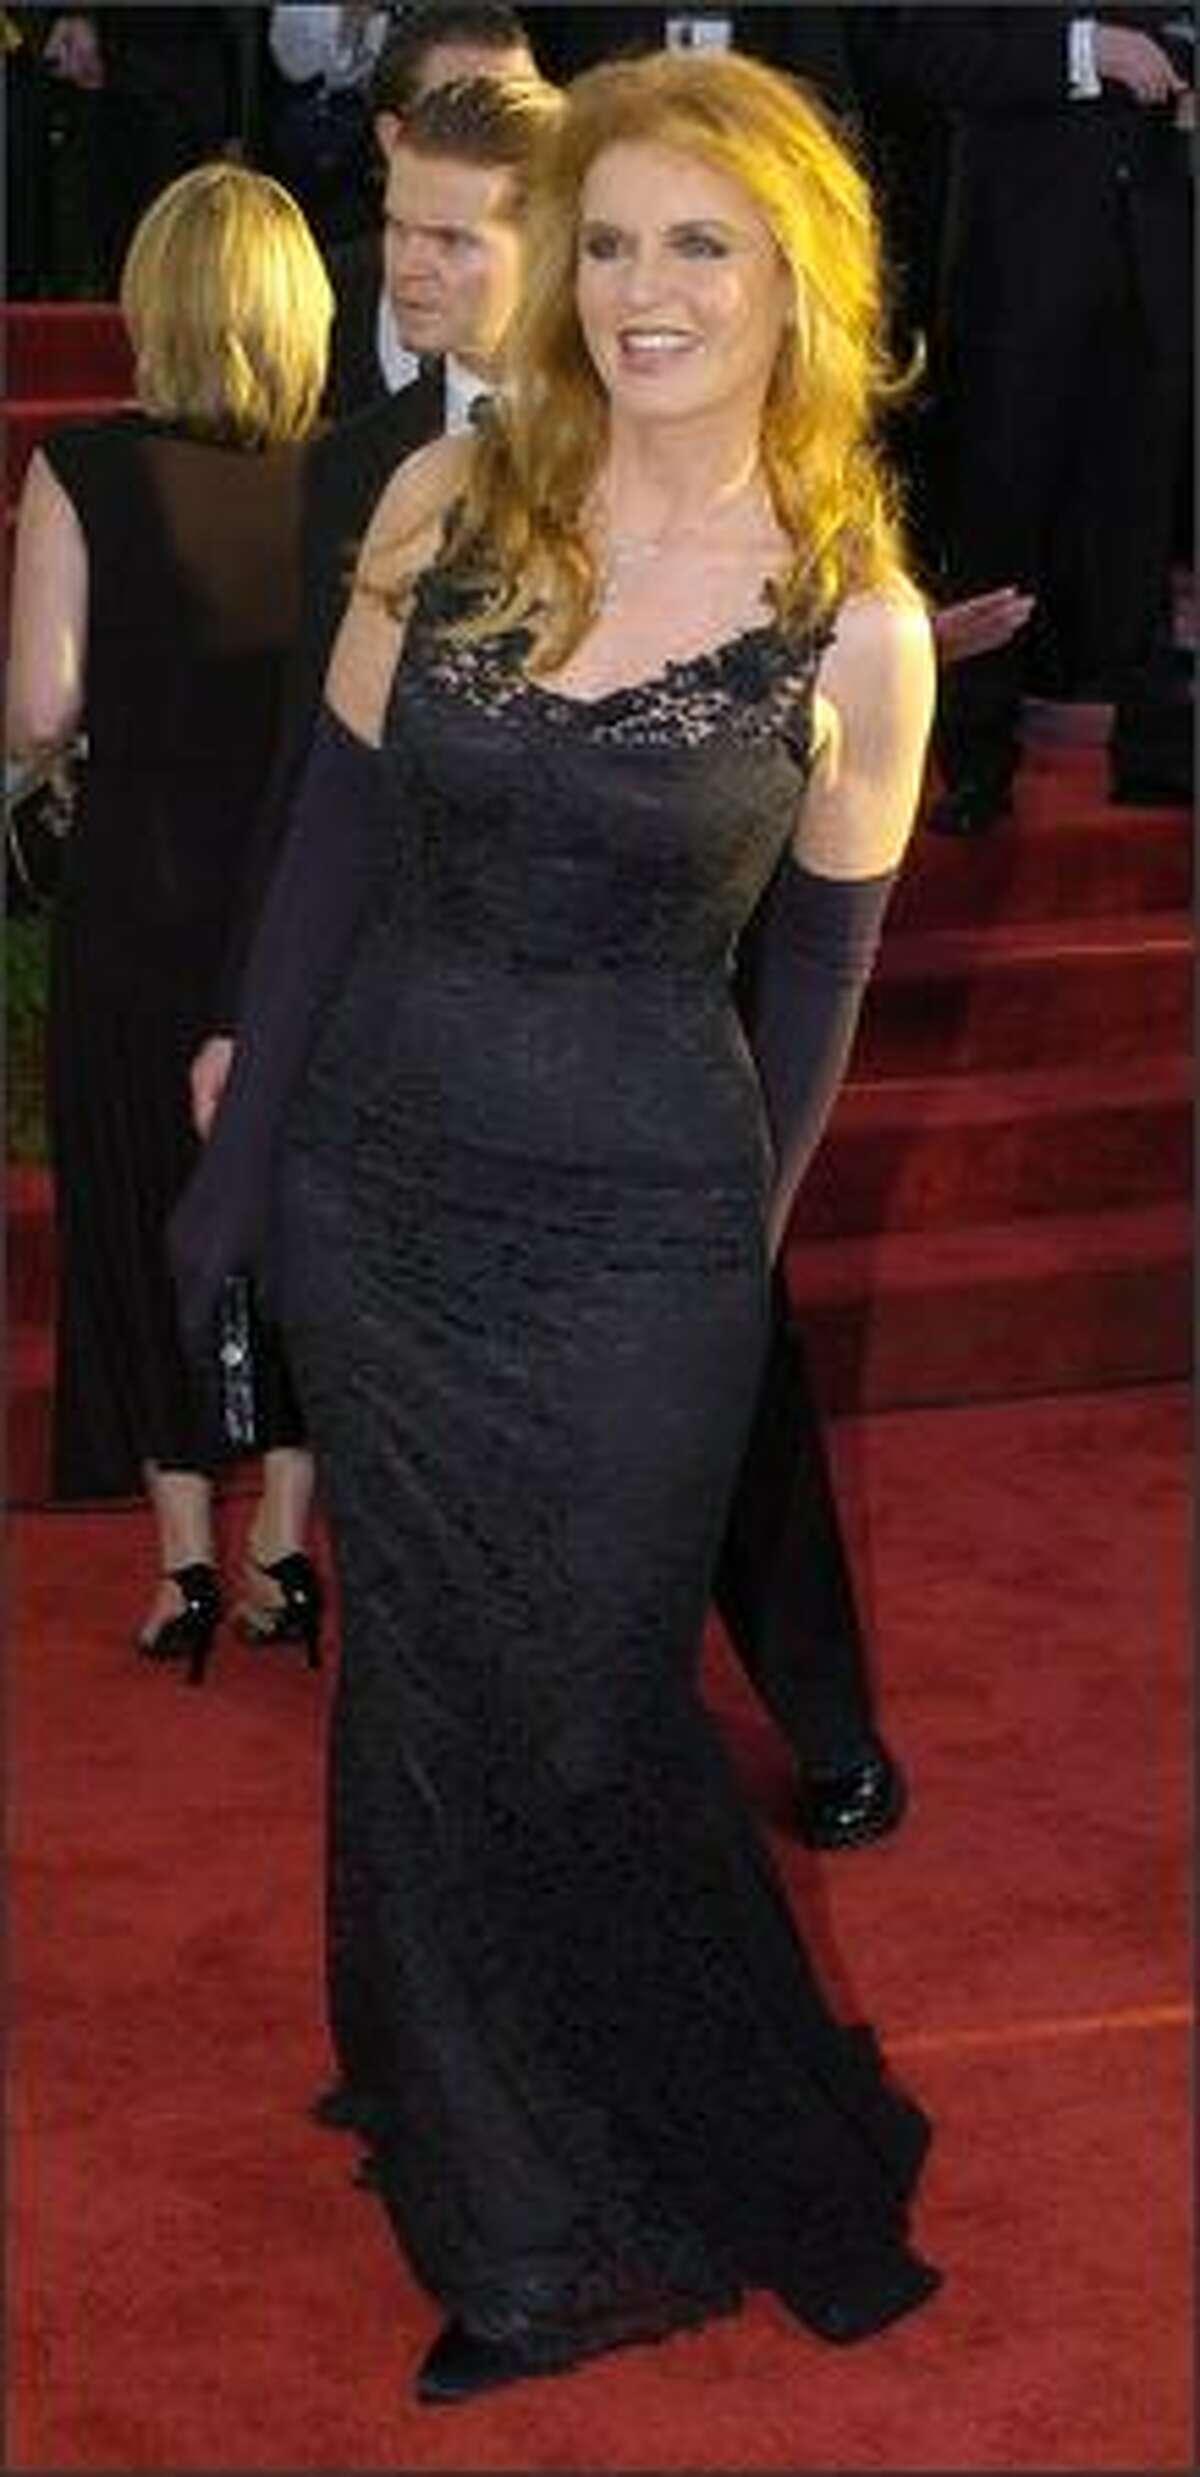 Duchess of York Sarah Ferguson arrives for the 61st Annual Golden Globe Awards in Beverly Hills, Calif., where she will be a presenter during the show. (AP Photo/Mark J. Terrill)